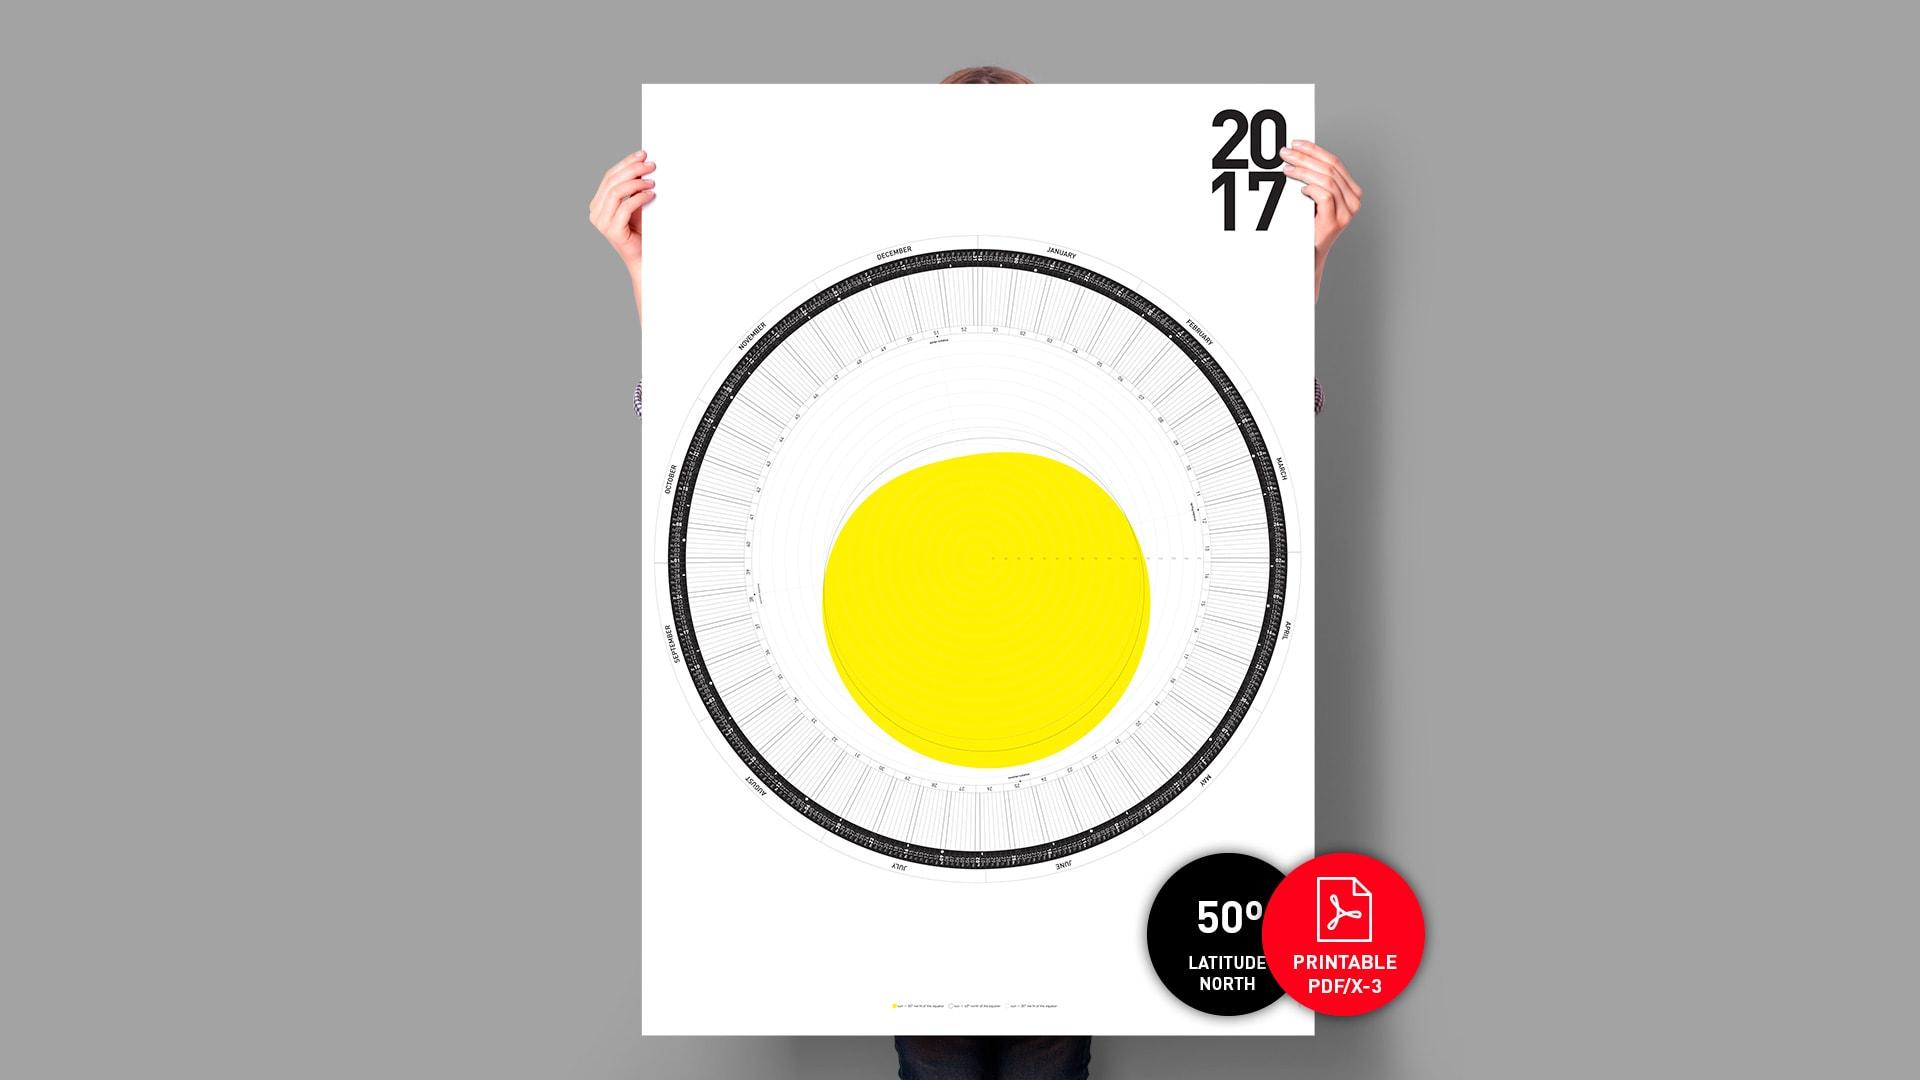 The-Circular-Calendar-2017-50-degrees-north-webmockup-1920-50